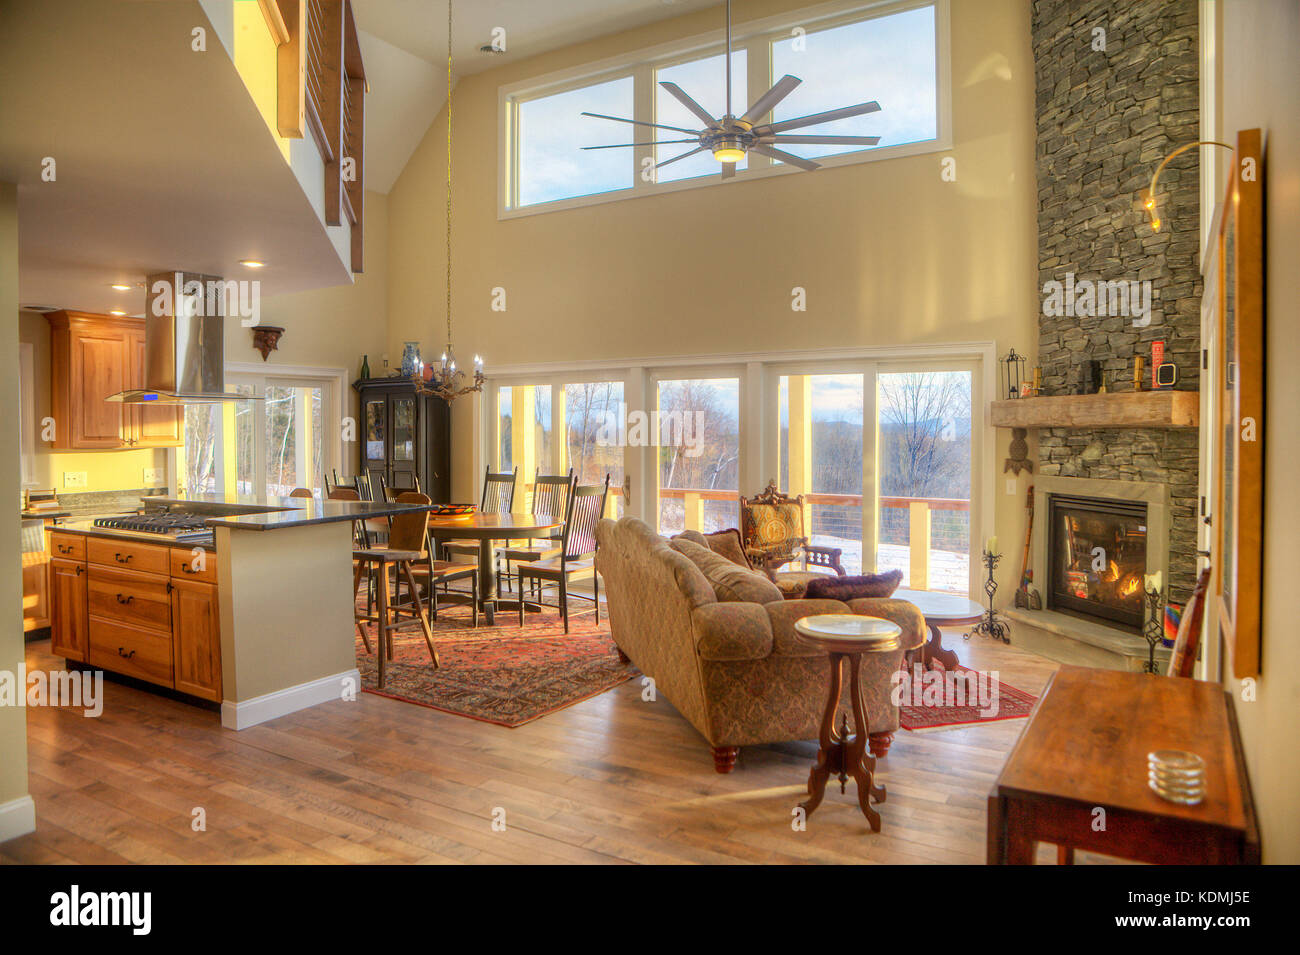 Comedor moderno con chimenea beautiful la chimenea al for Cocina abierta sala de estar